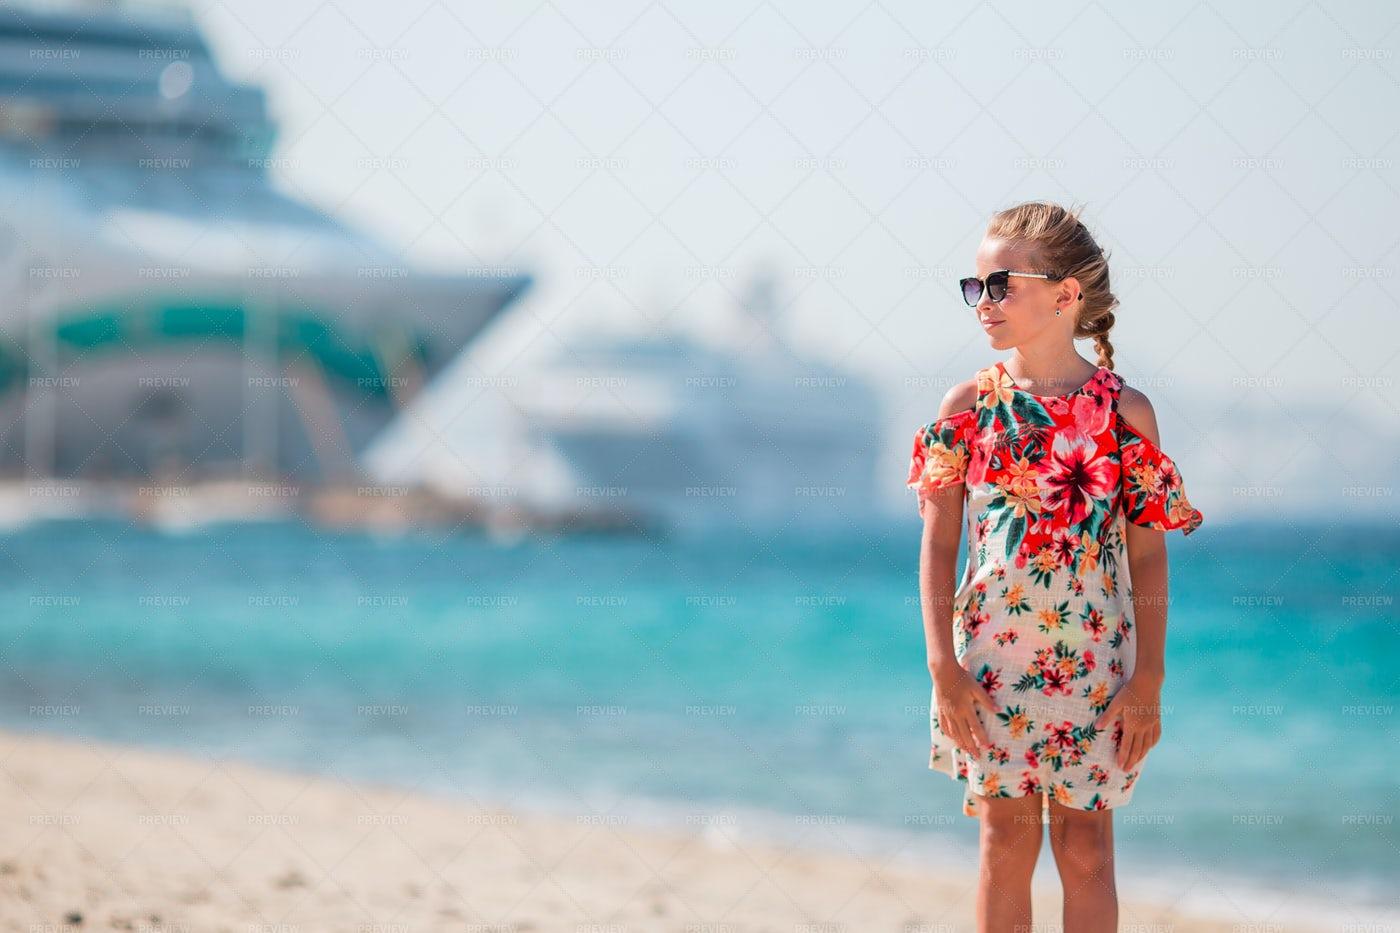 Child On Beach Near Cruise Ships: Stock Photos